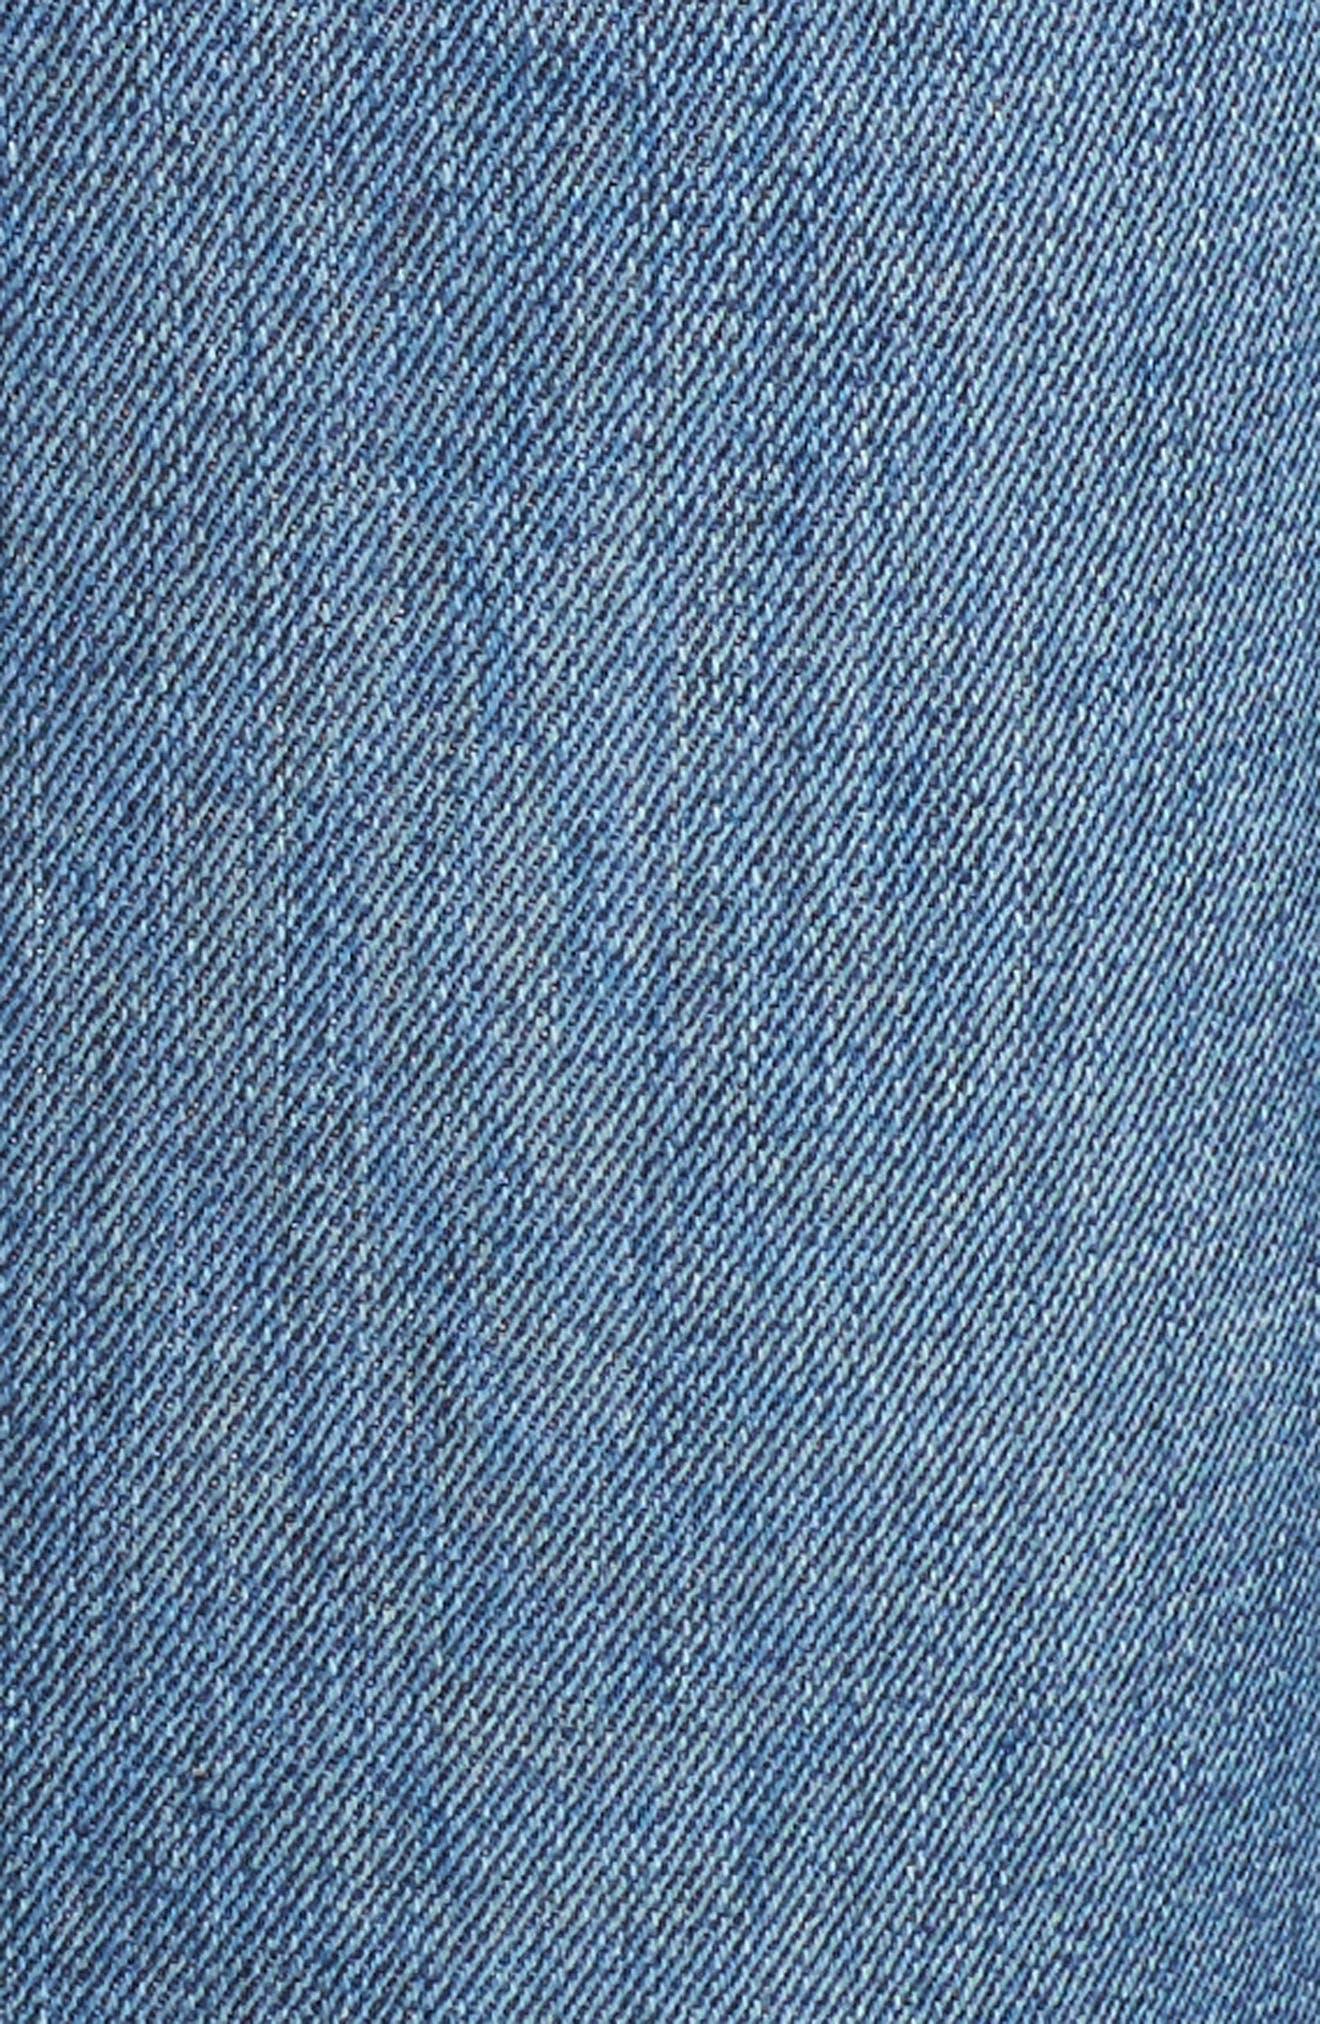 Alternate Image 5  - PARKER SMITH Bombshell Raw Hem Stretch Skinny Jeans (Dawn)